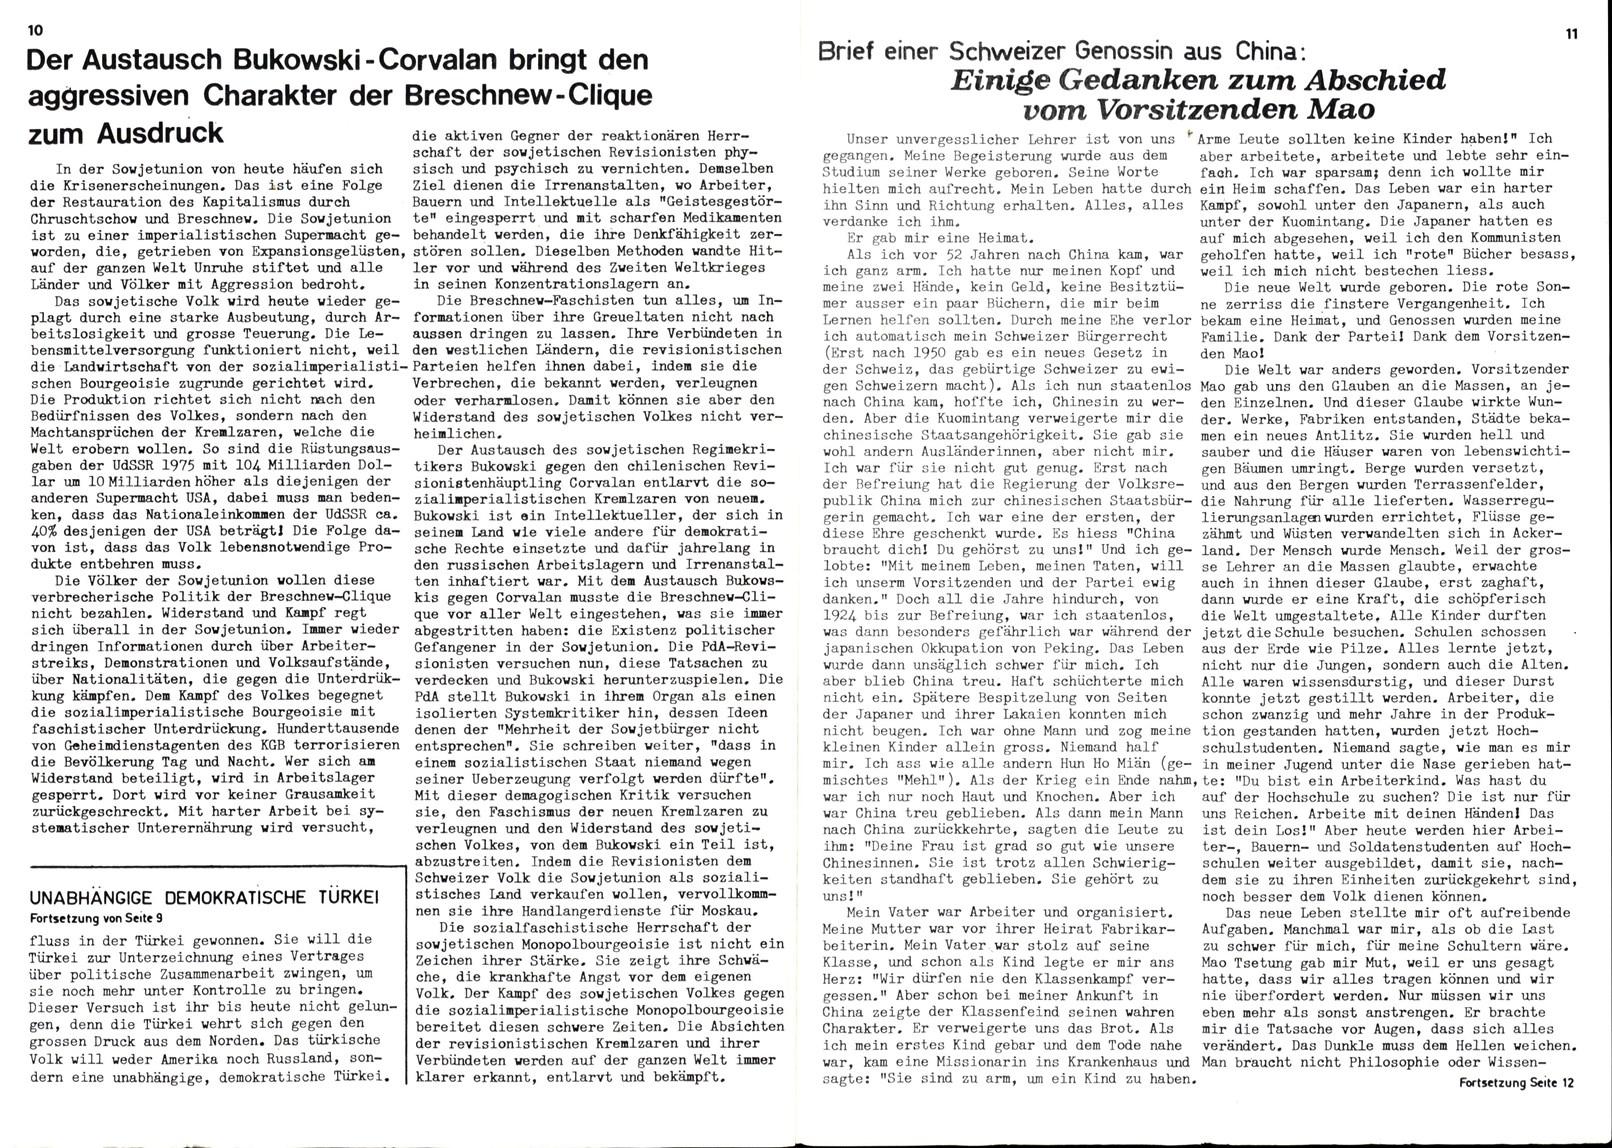 Schweiz_KPSML_Oktober_19770400_109_006